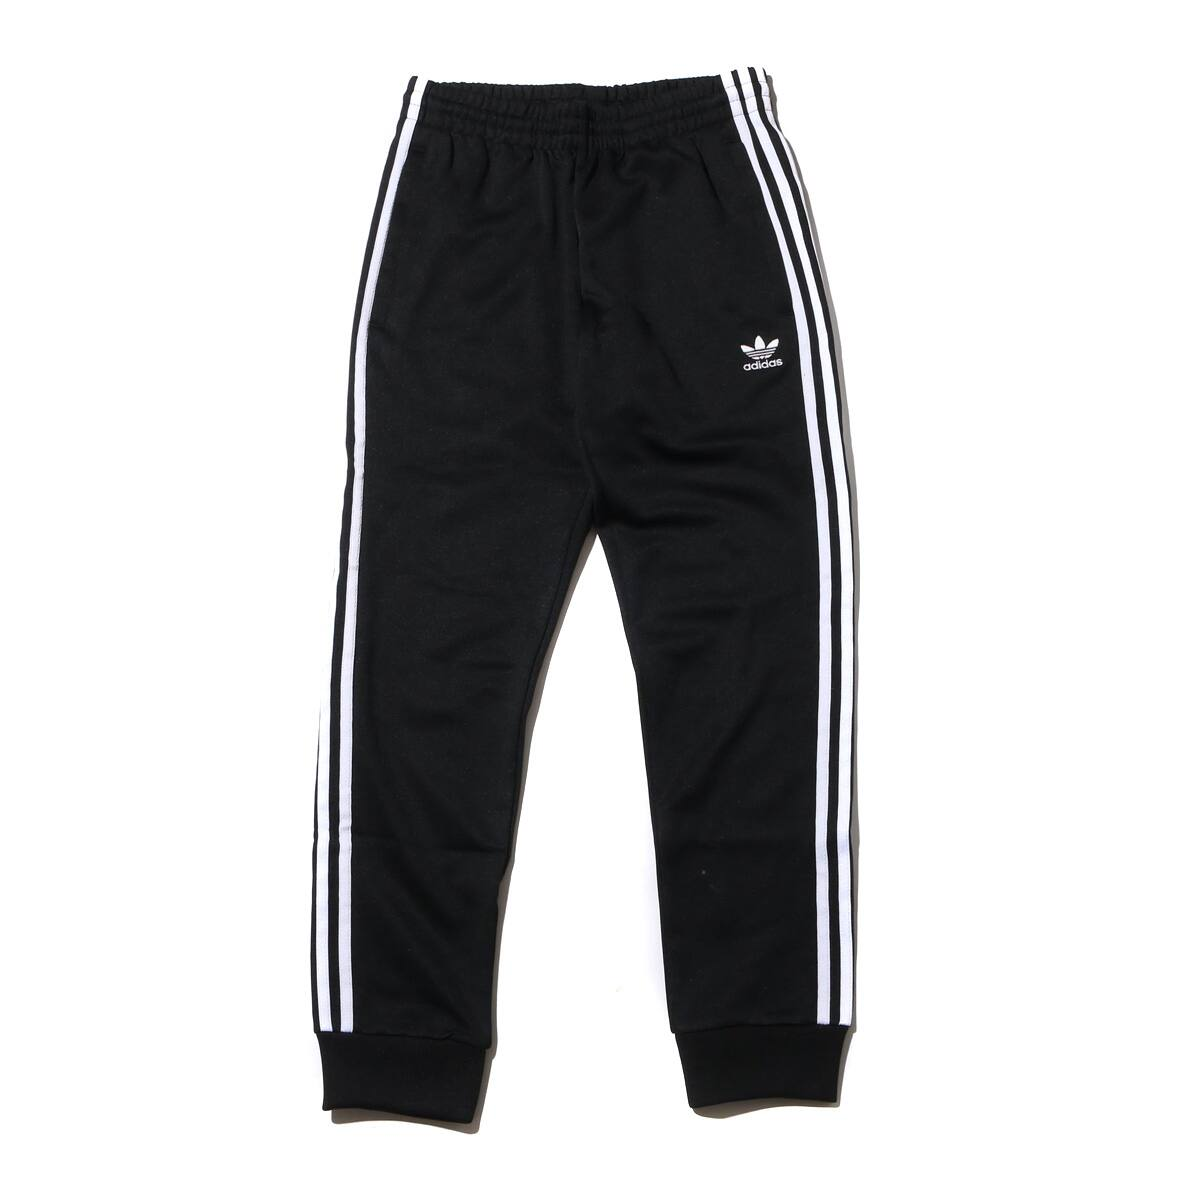 adidas Originals SST TRACK PANTS  Black 19SS-I_photo_large